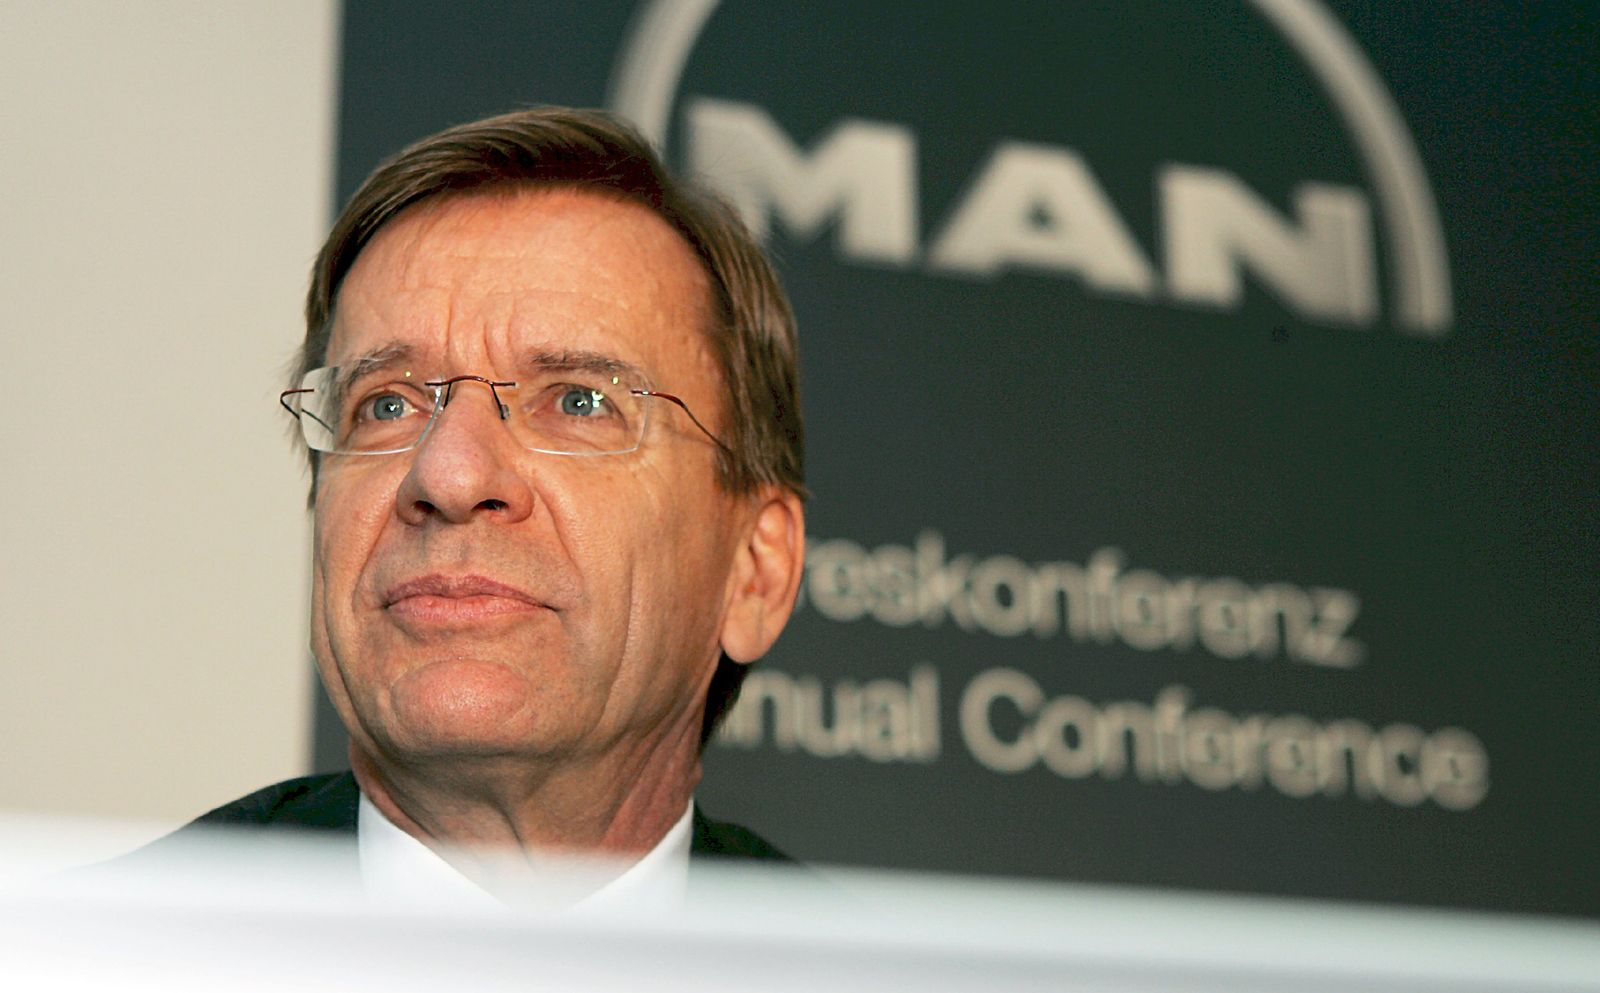 Bilanz Pk MAN - Hakan Samuelsson